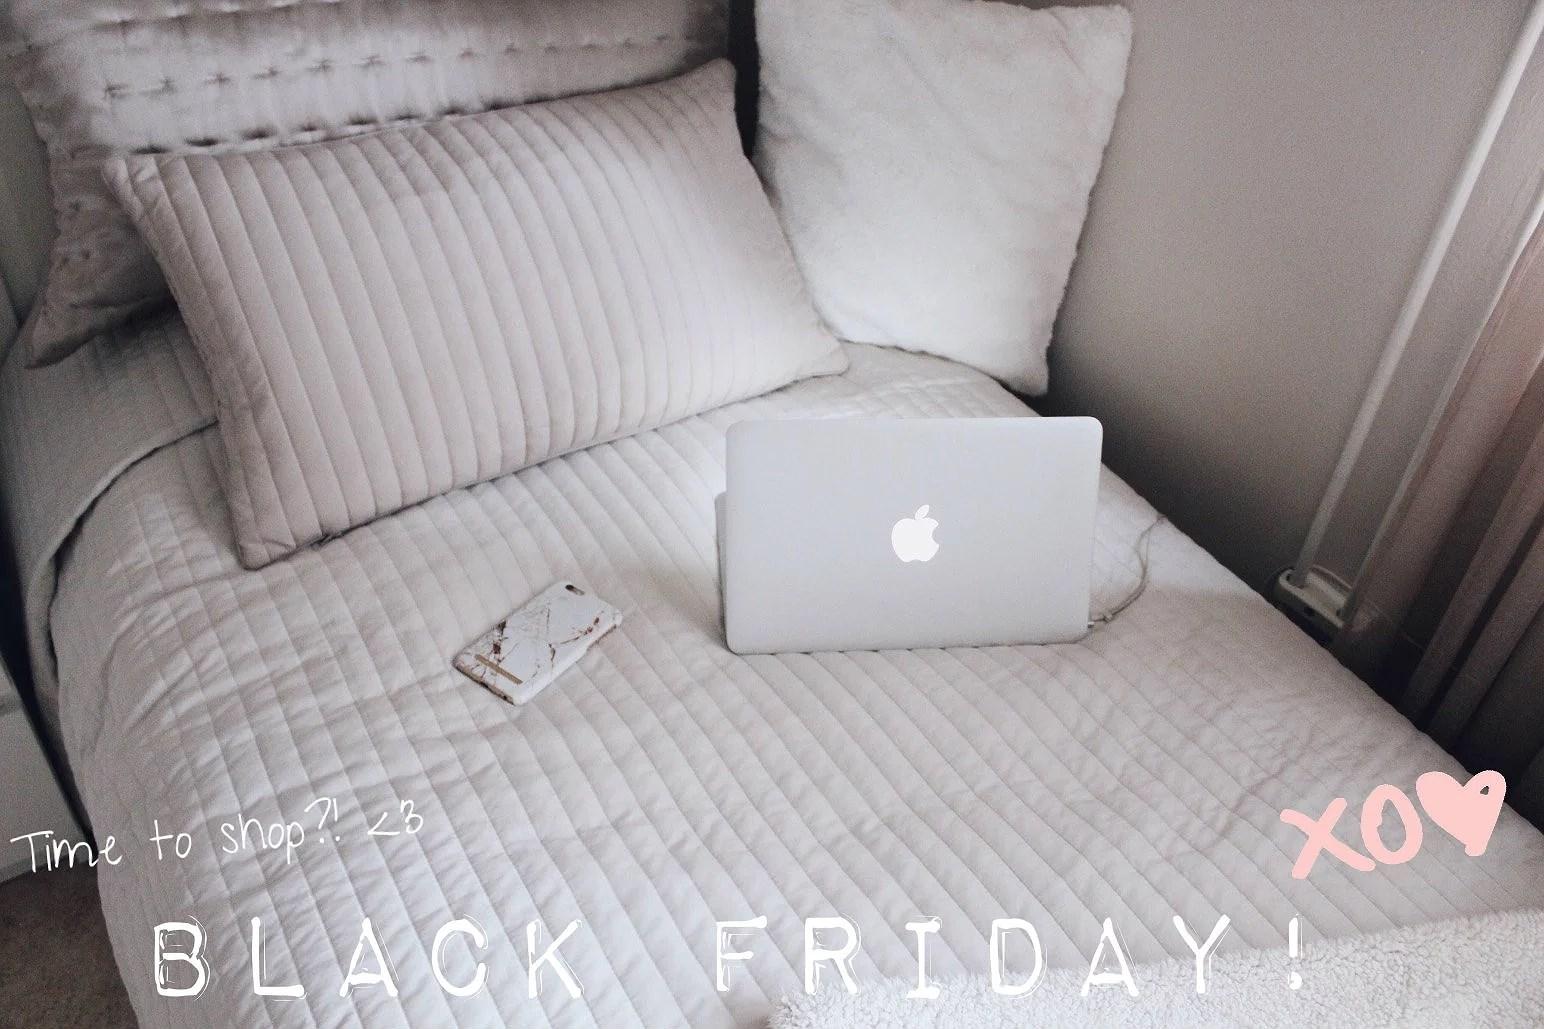 BLACK FRIDAY GUIDE